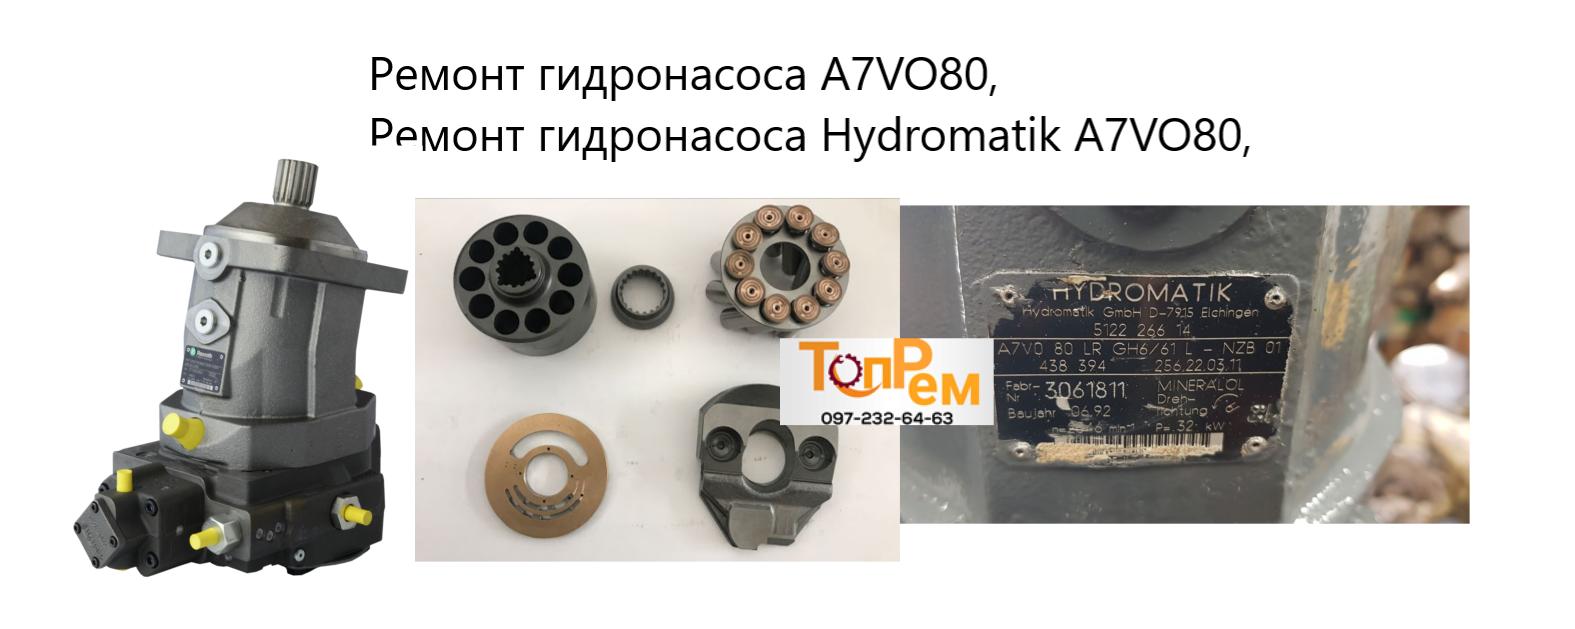 Ремонт гидронасоса A7VO80